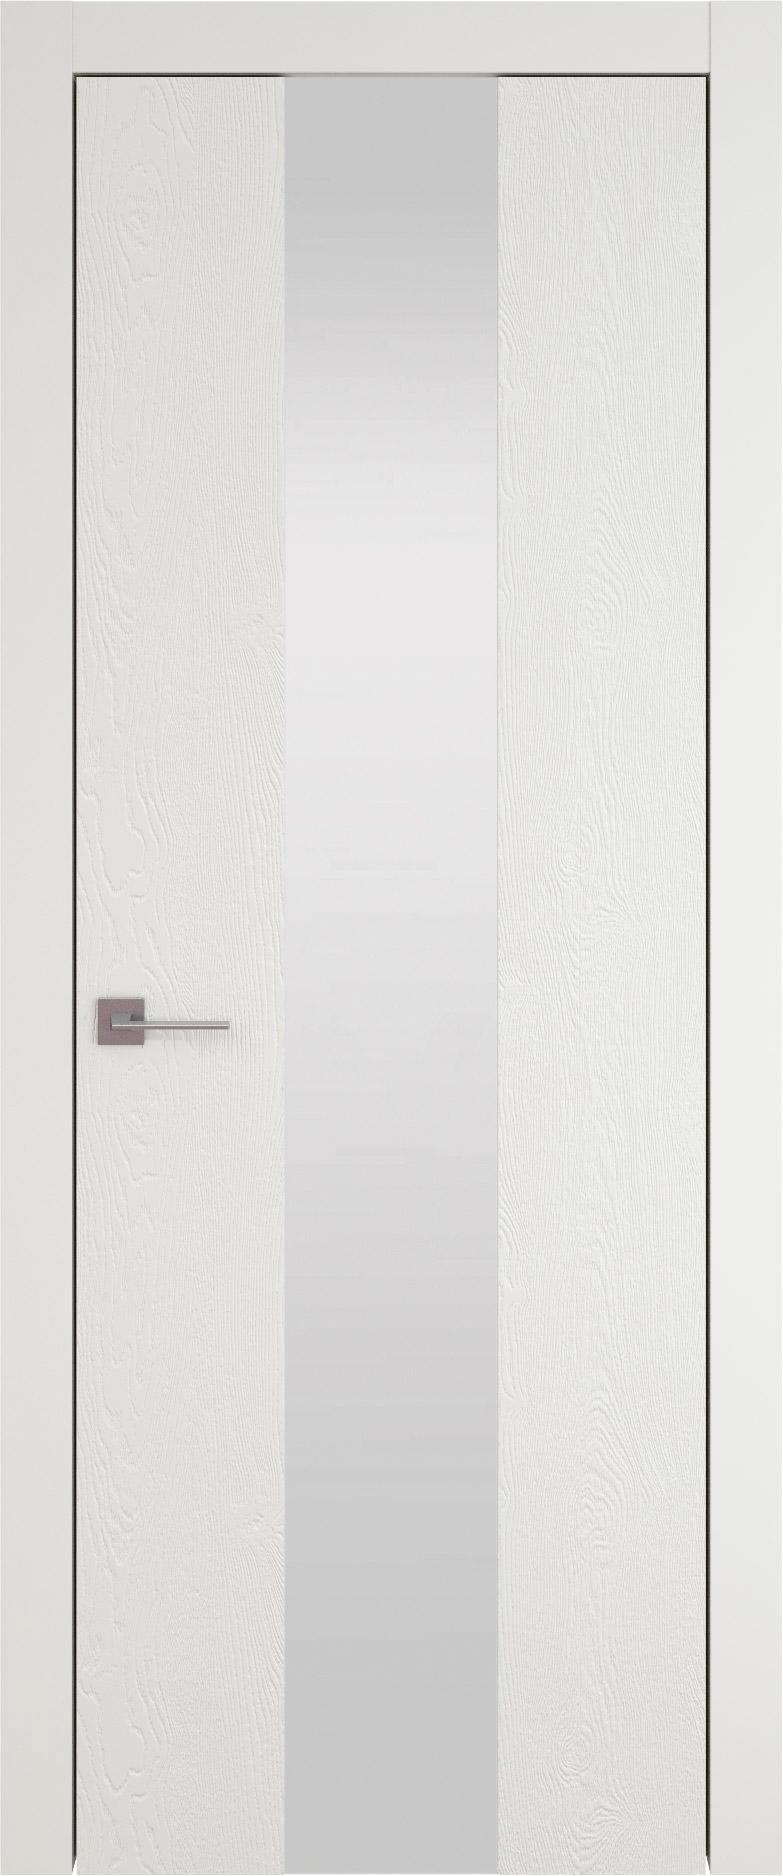 Tivoli Ж-1 цвет - Бежевая эмаль по шпону (RAL 9010) Со стеклом (ДО)